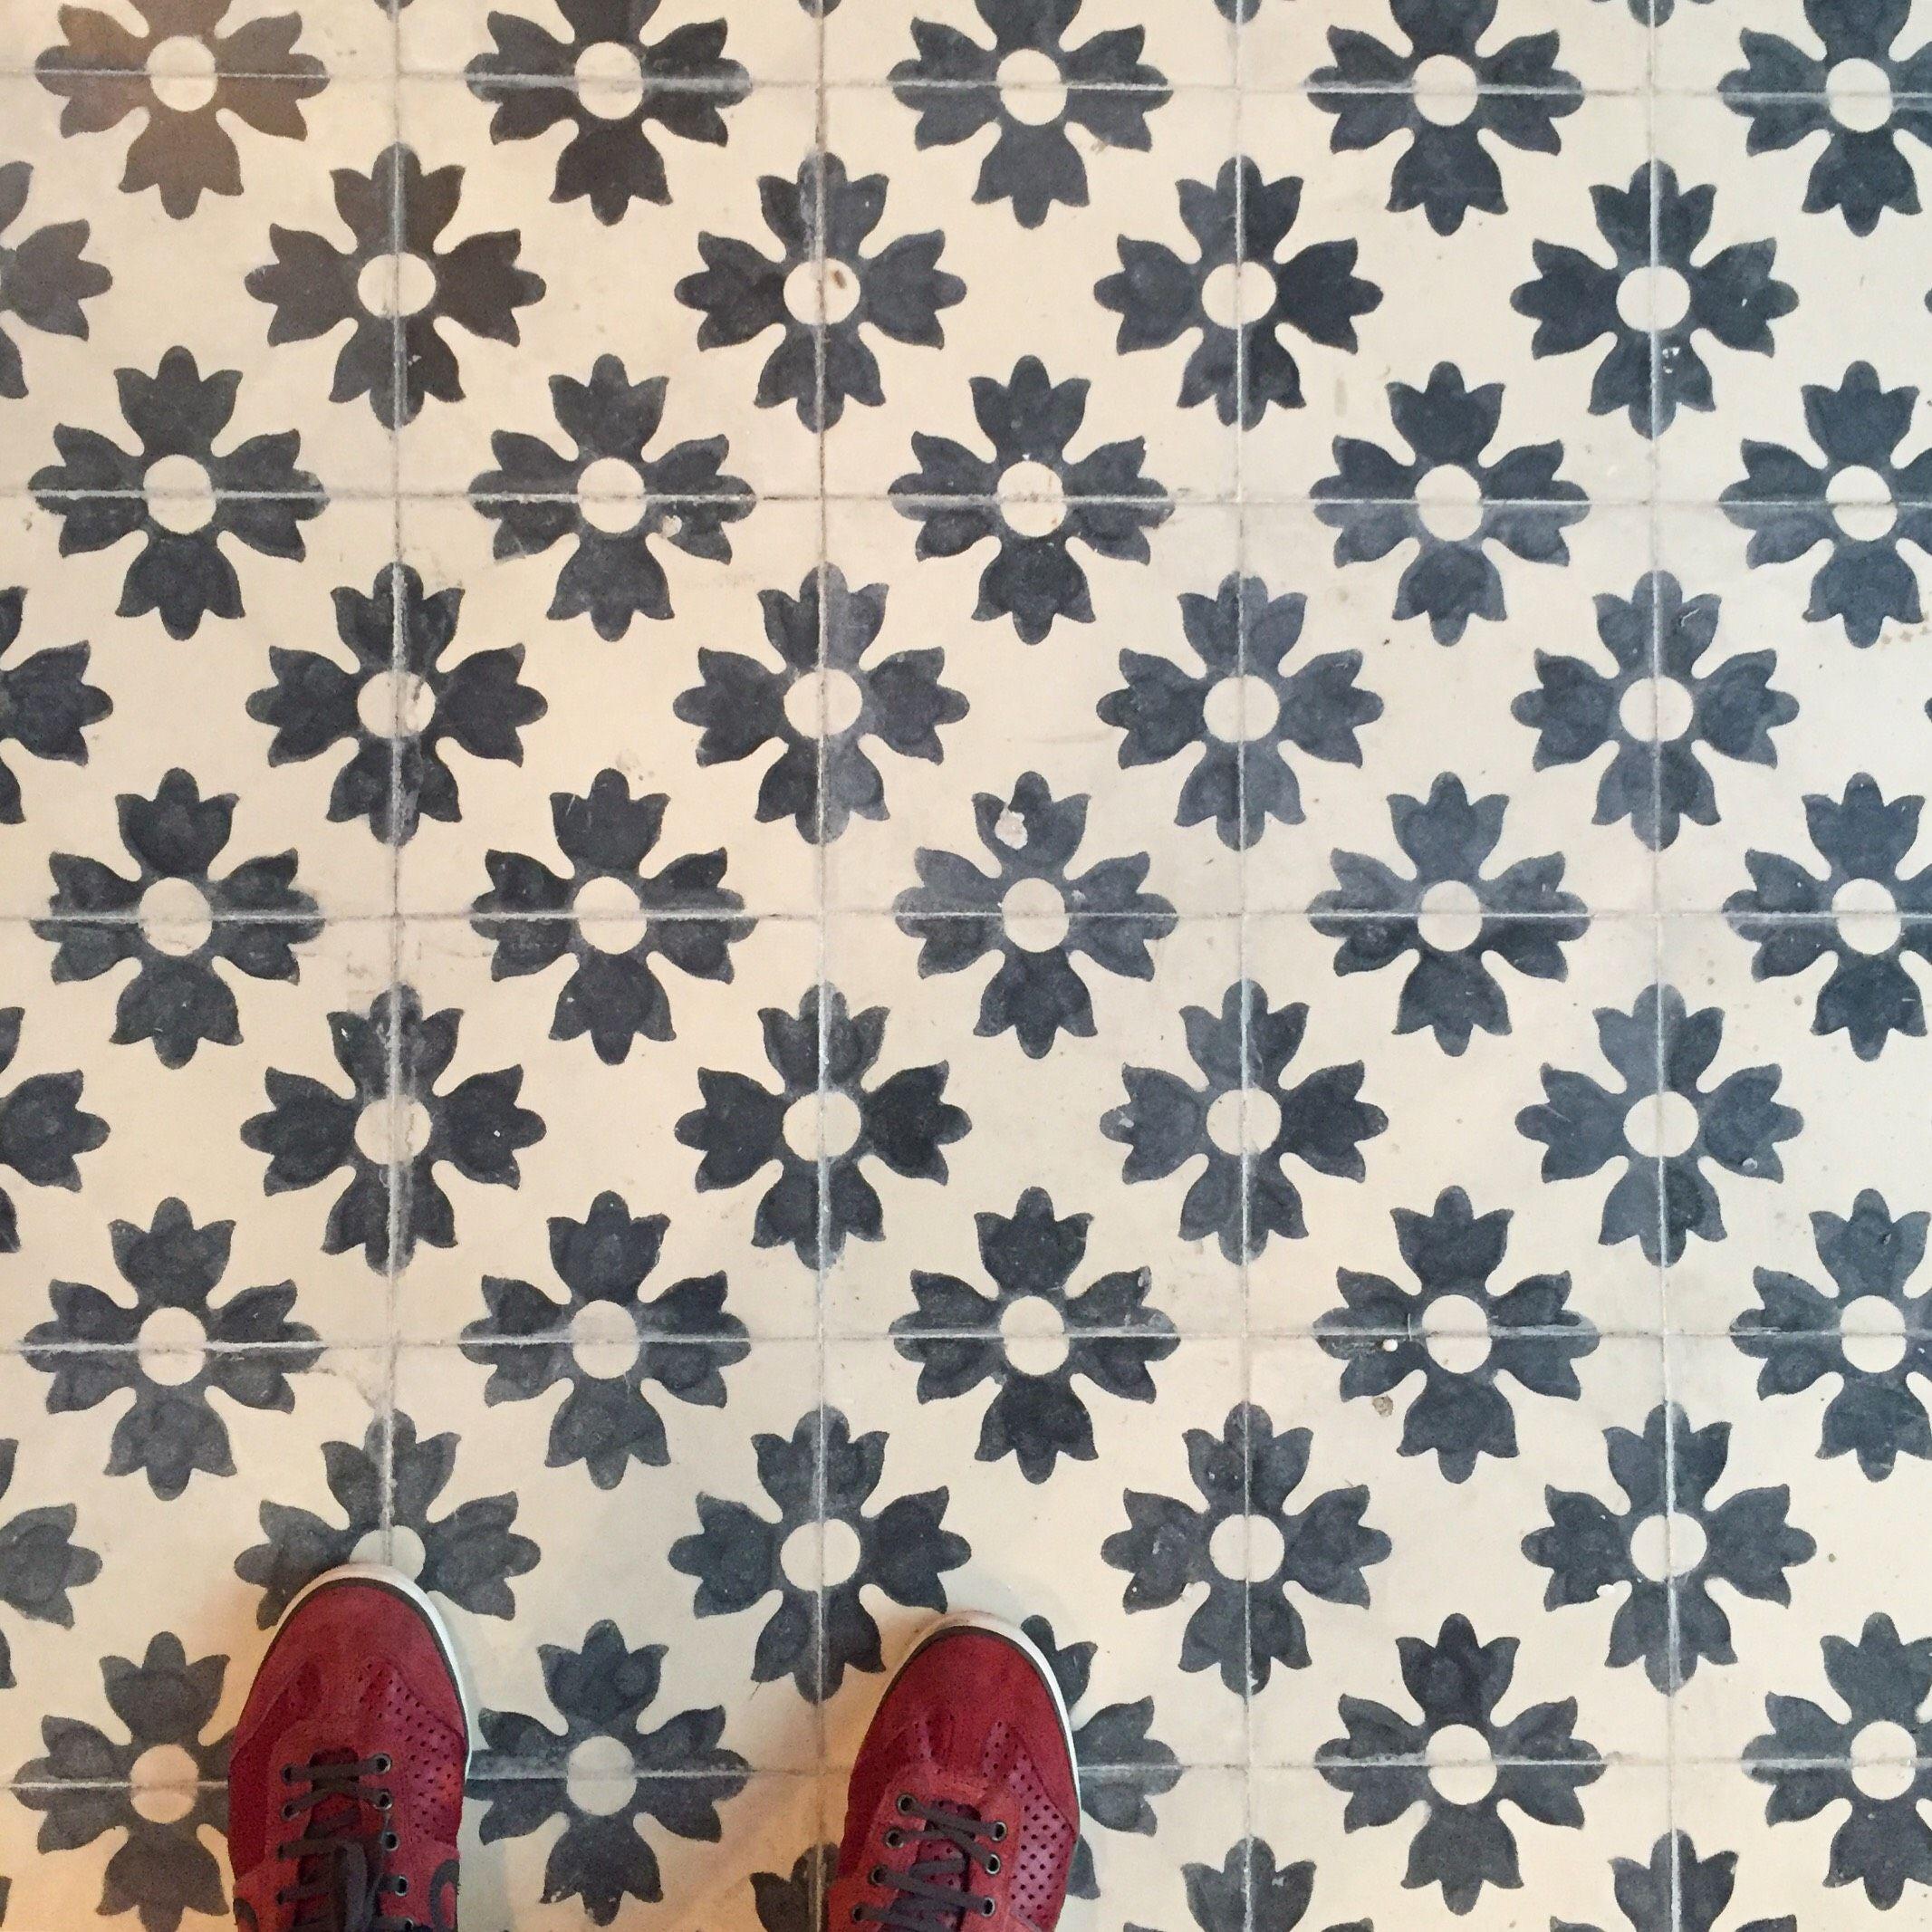 Bespoke aged Mosaic in @sohohousebarcelona by Huguet Mallorca ...